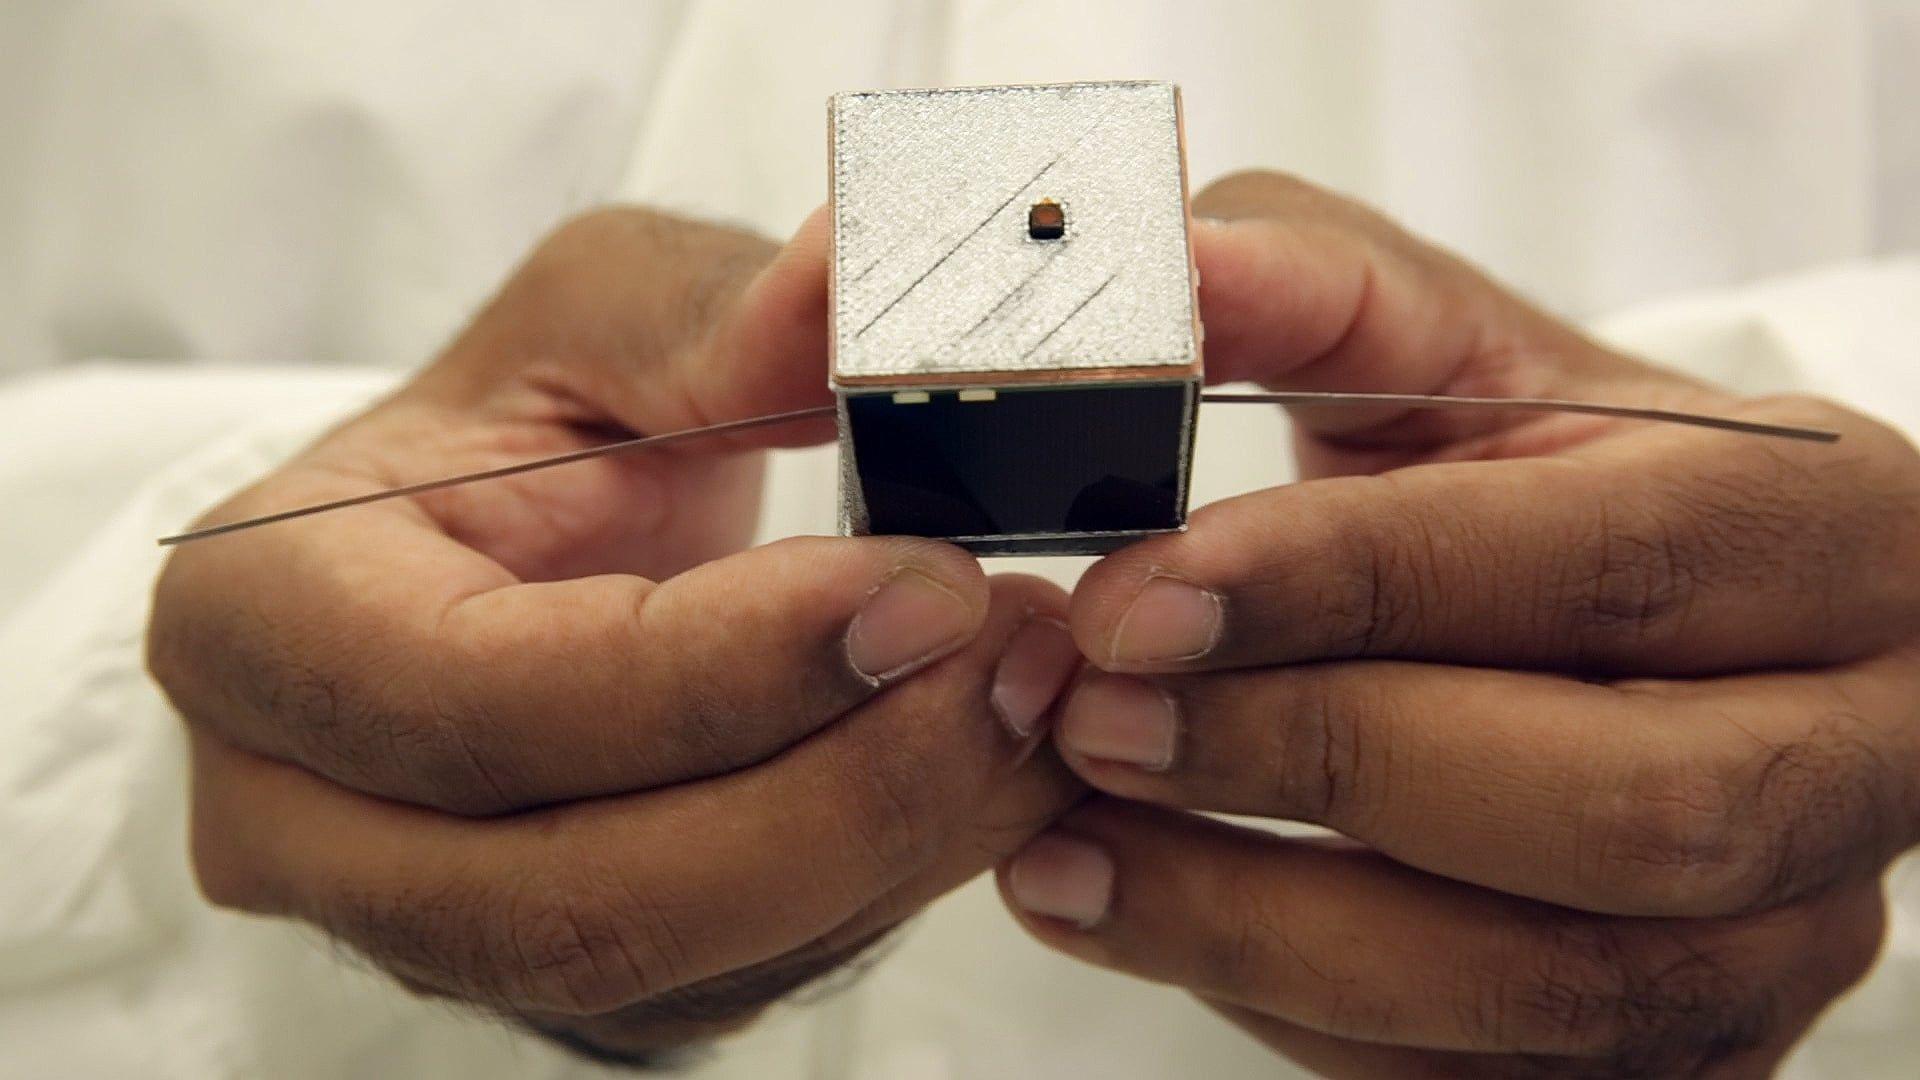 SunCube miniature satellites